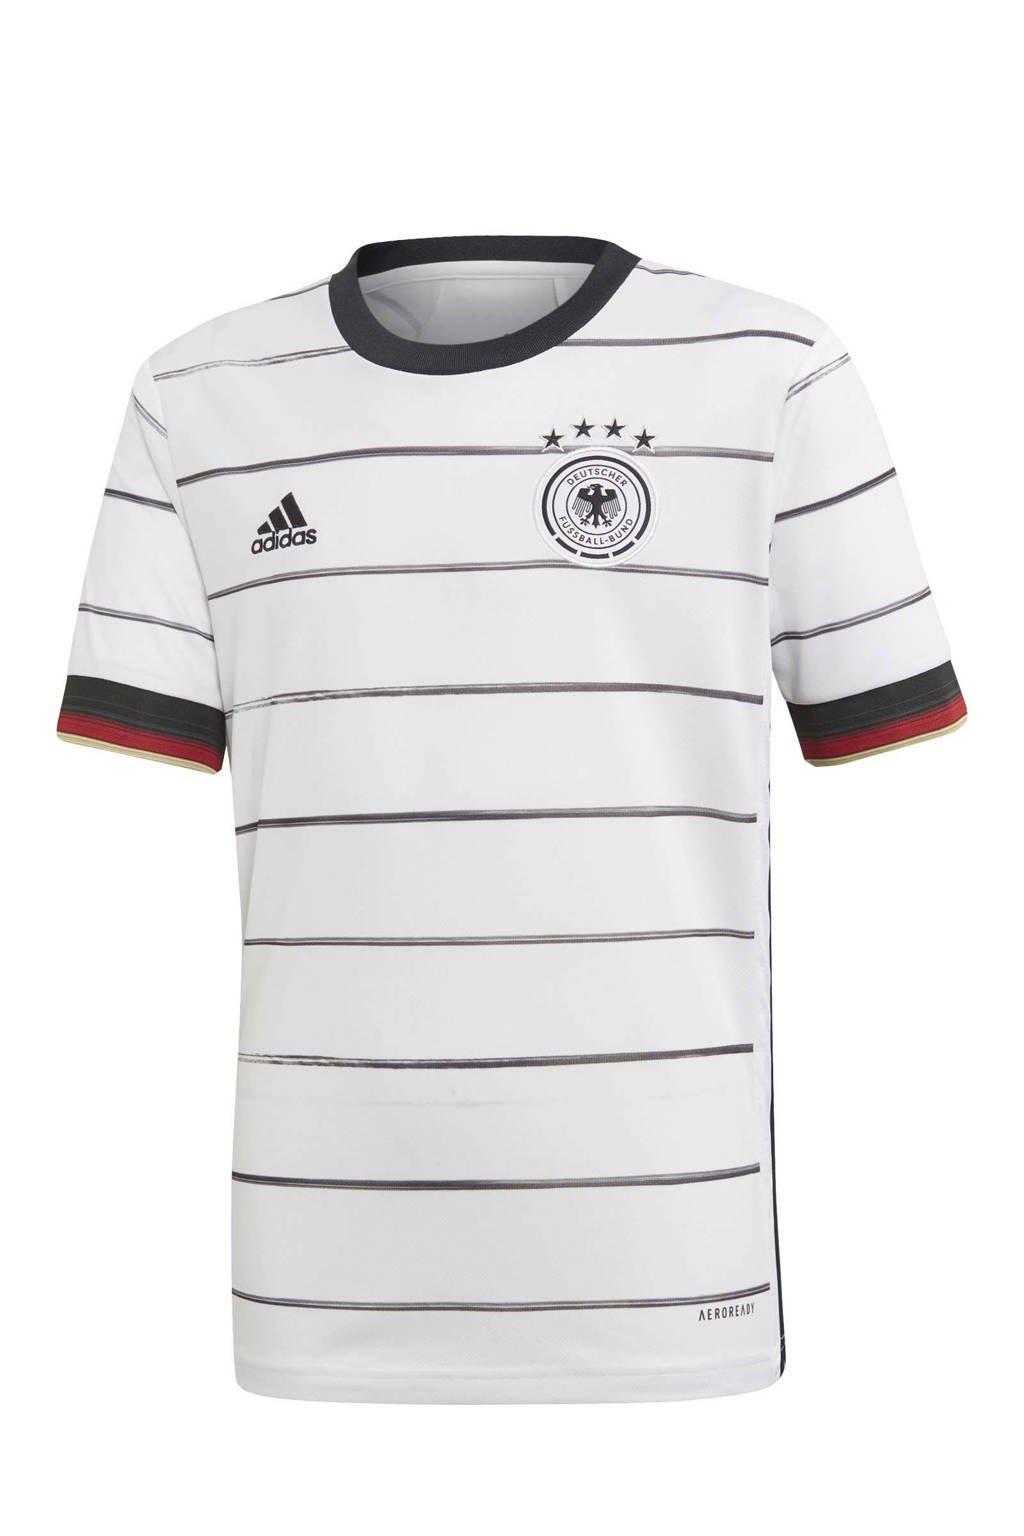 adidas performance Junior Duitsland voetbalshirt, Jongens/meisjes